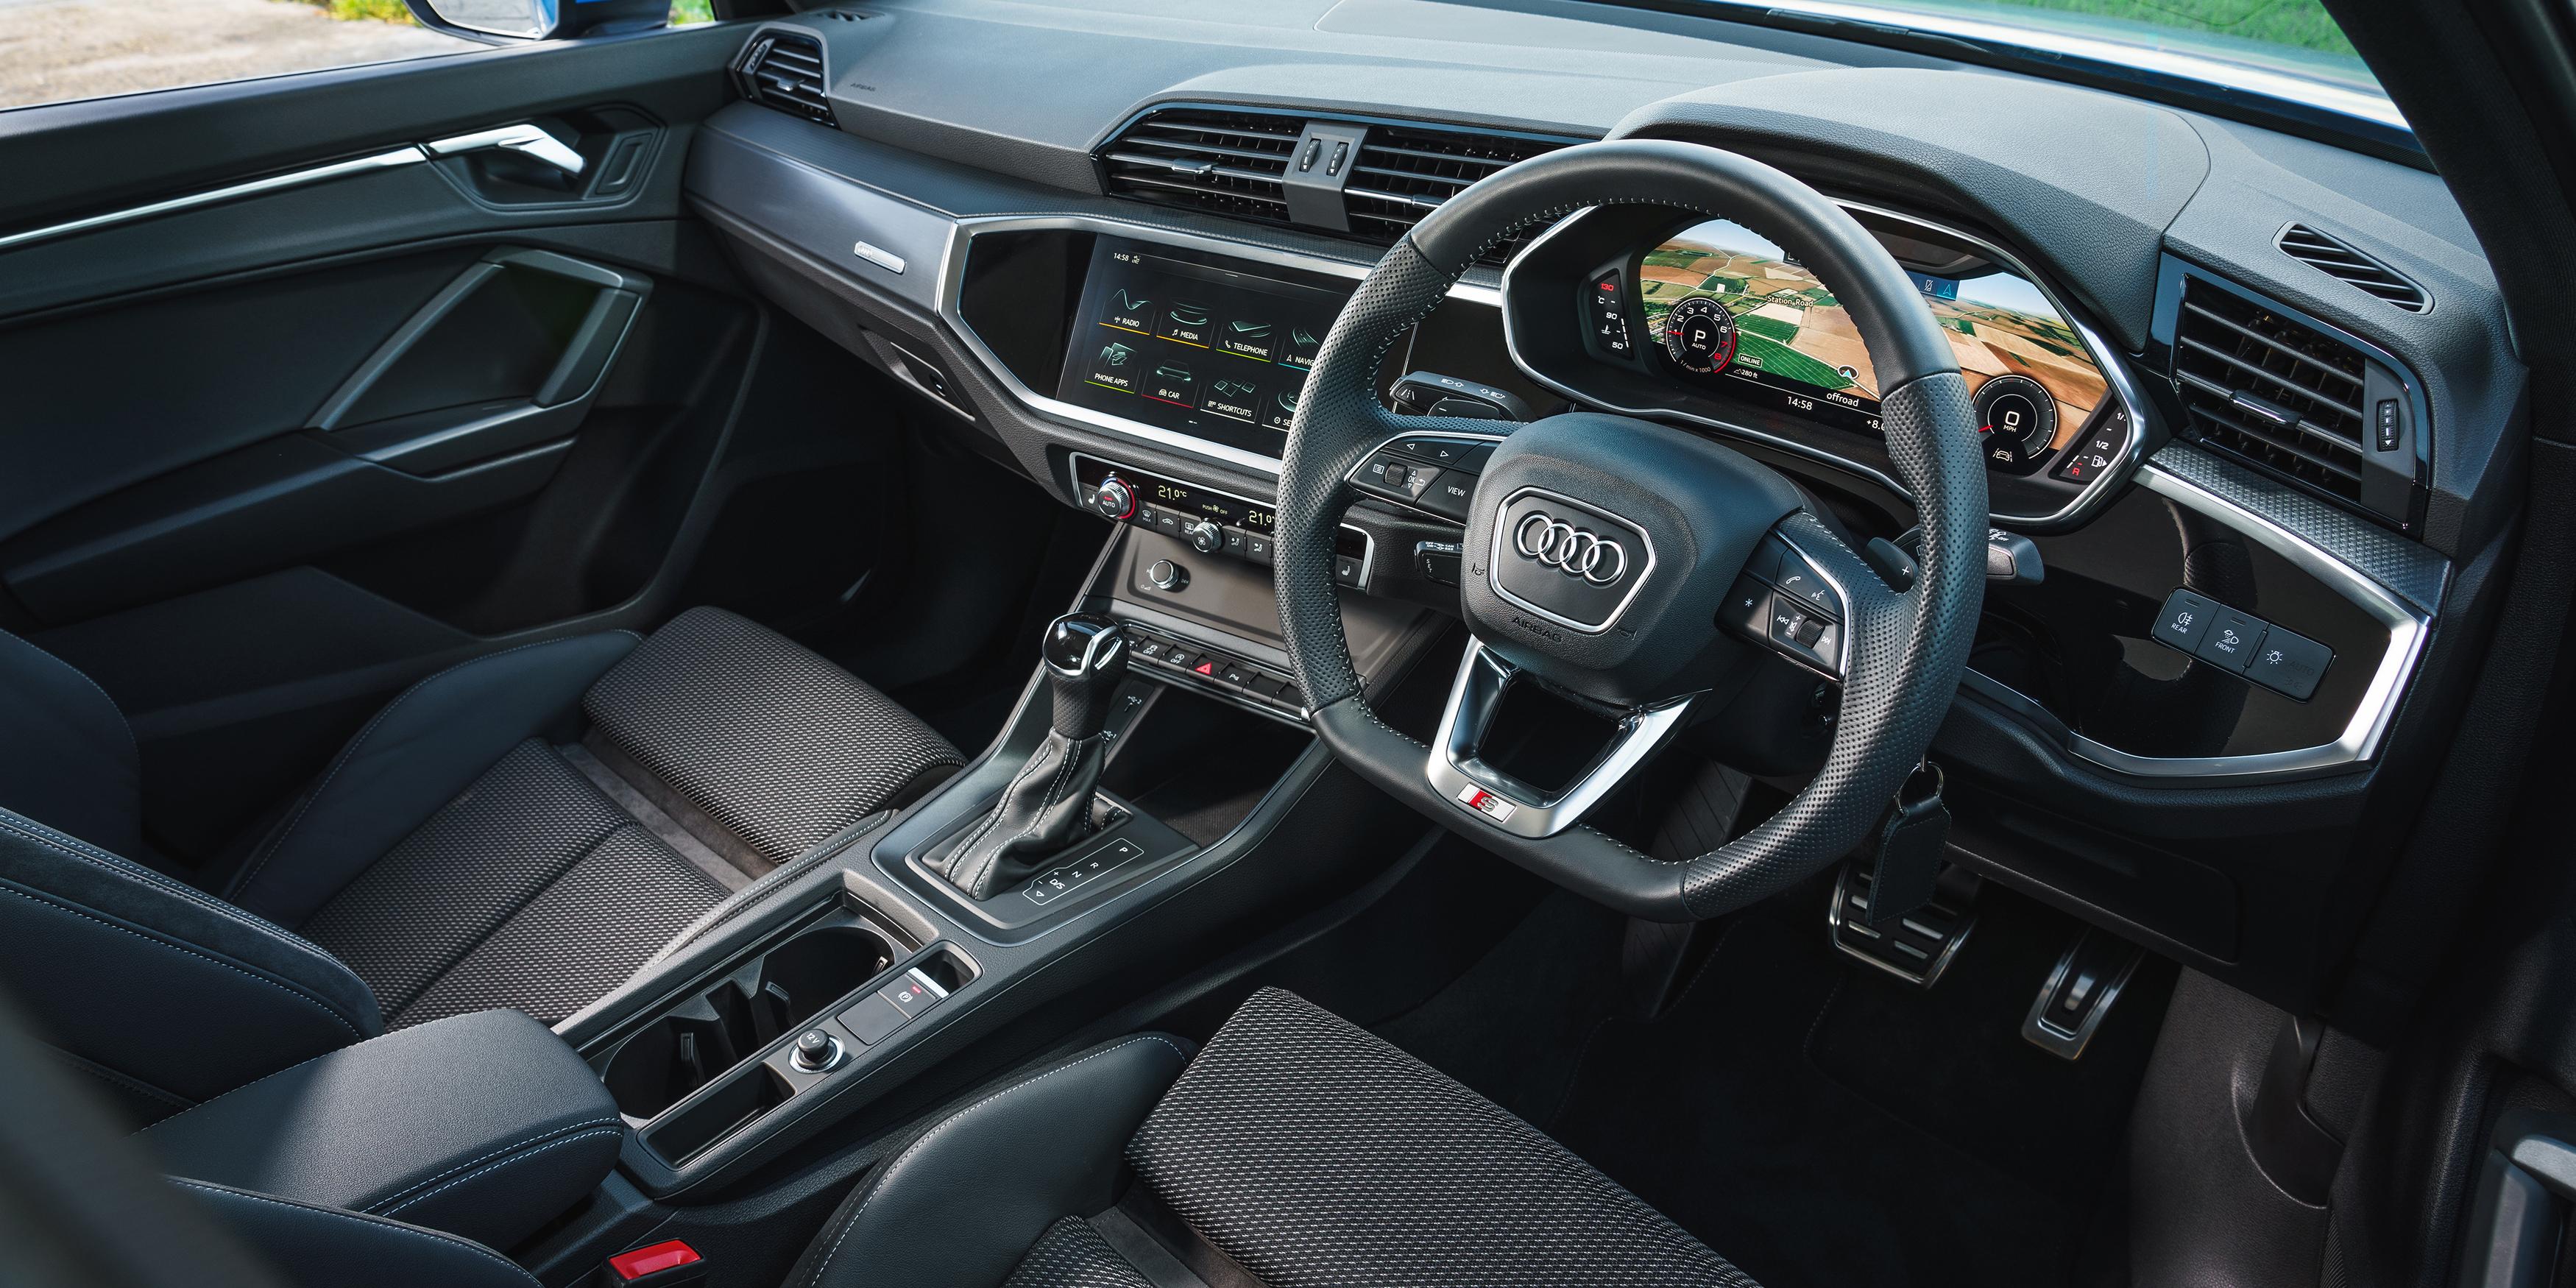 Audi Q3 Interior Infotainment Carwow